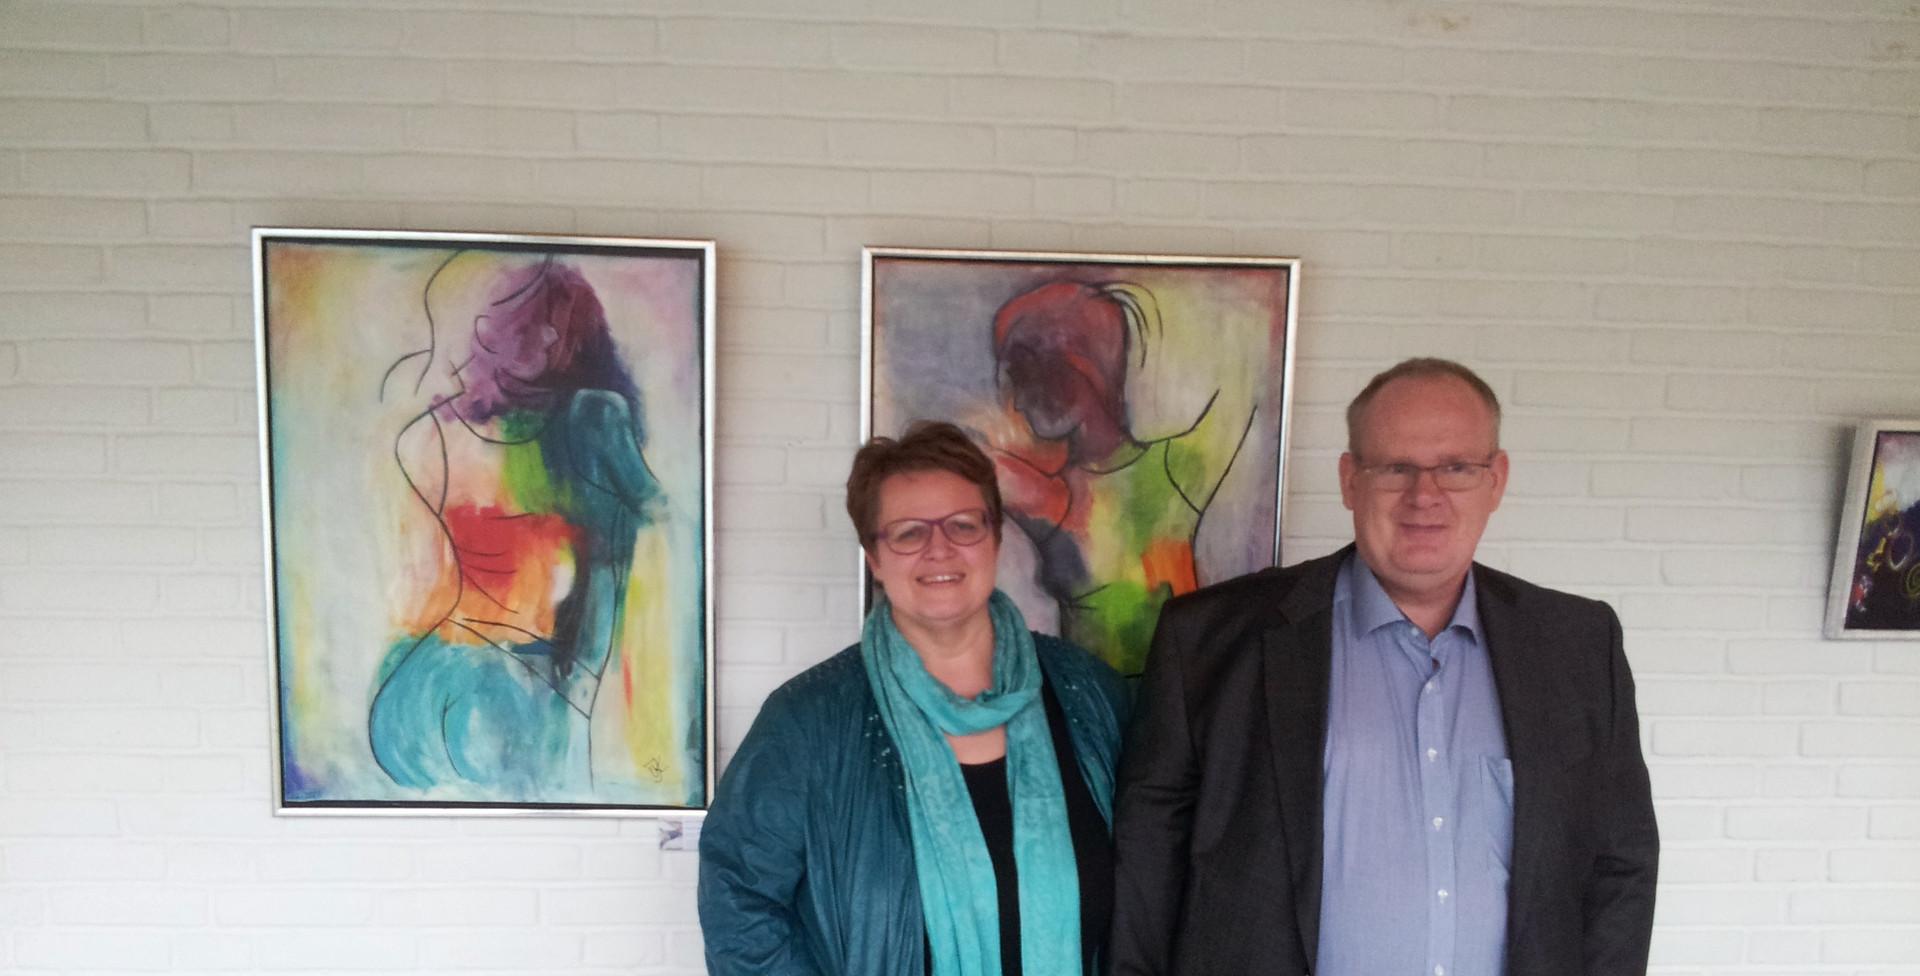 Tønder Sygehus - 2013